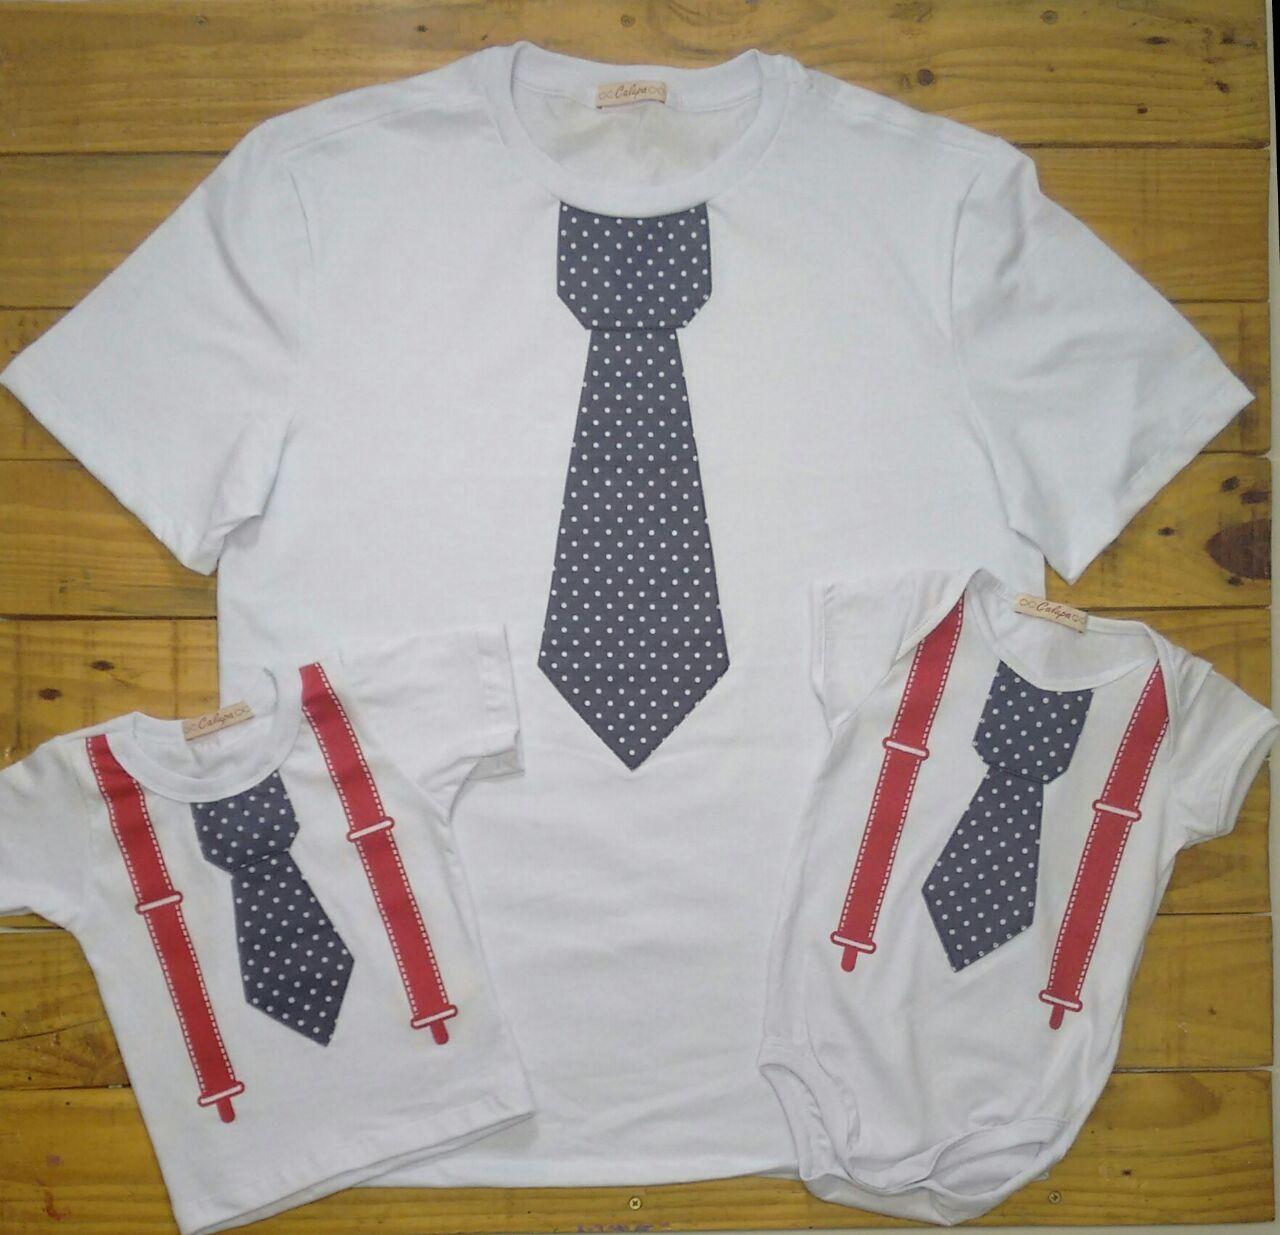 T-shirt gravata tal pai e tal filho! #talpaietalfilho #paidemenino #paiefilho #calupa #tshirt